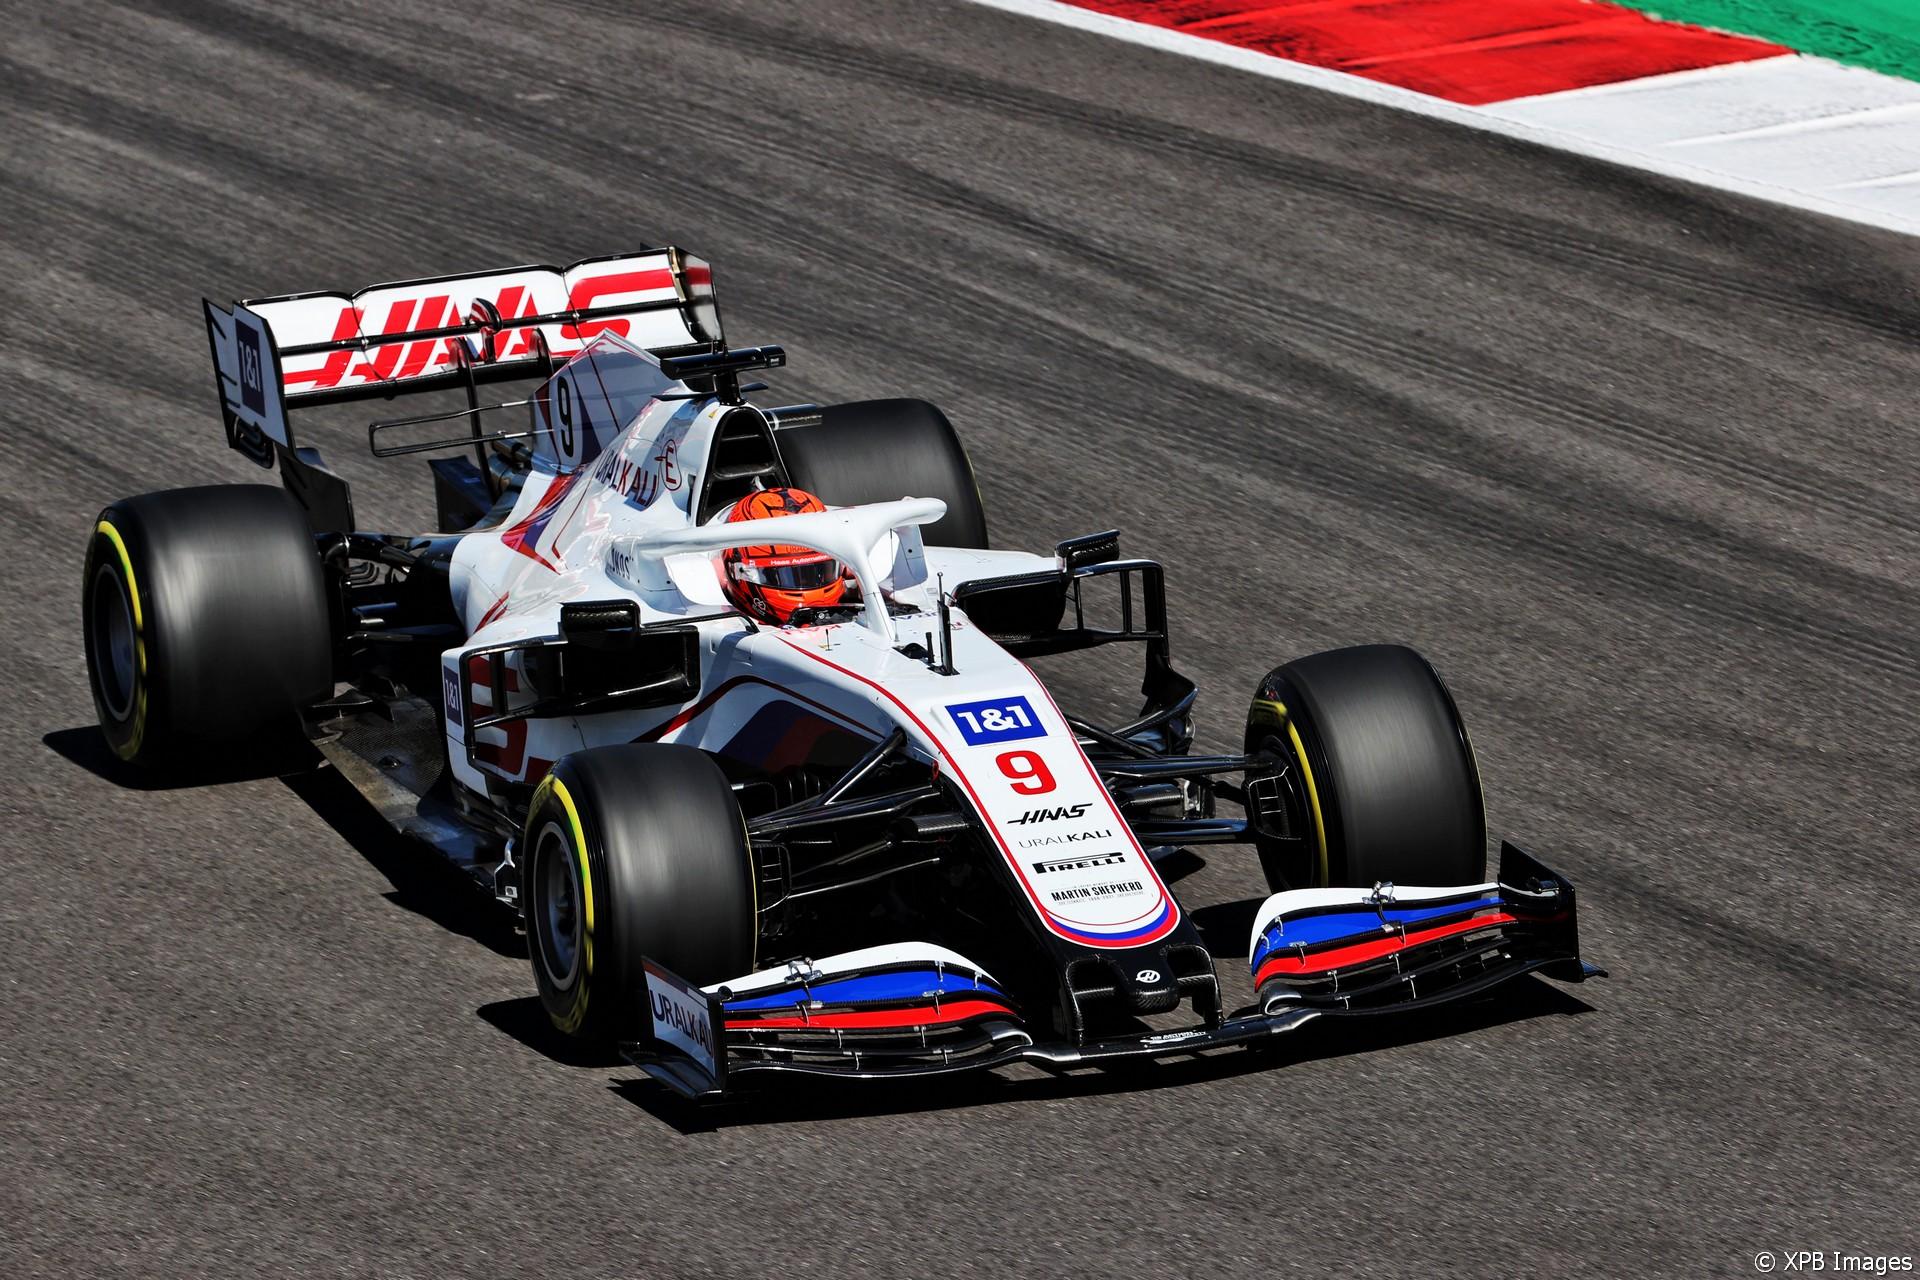 Nikita Mazepin, Haas, Autodromo do Algarve, 2021